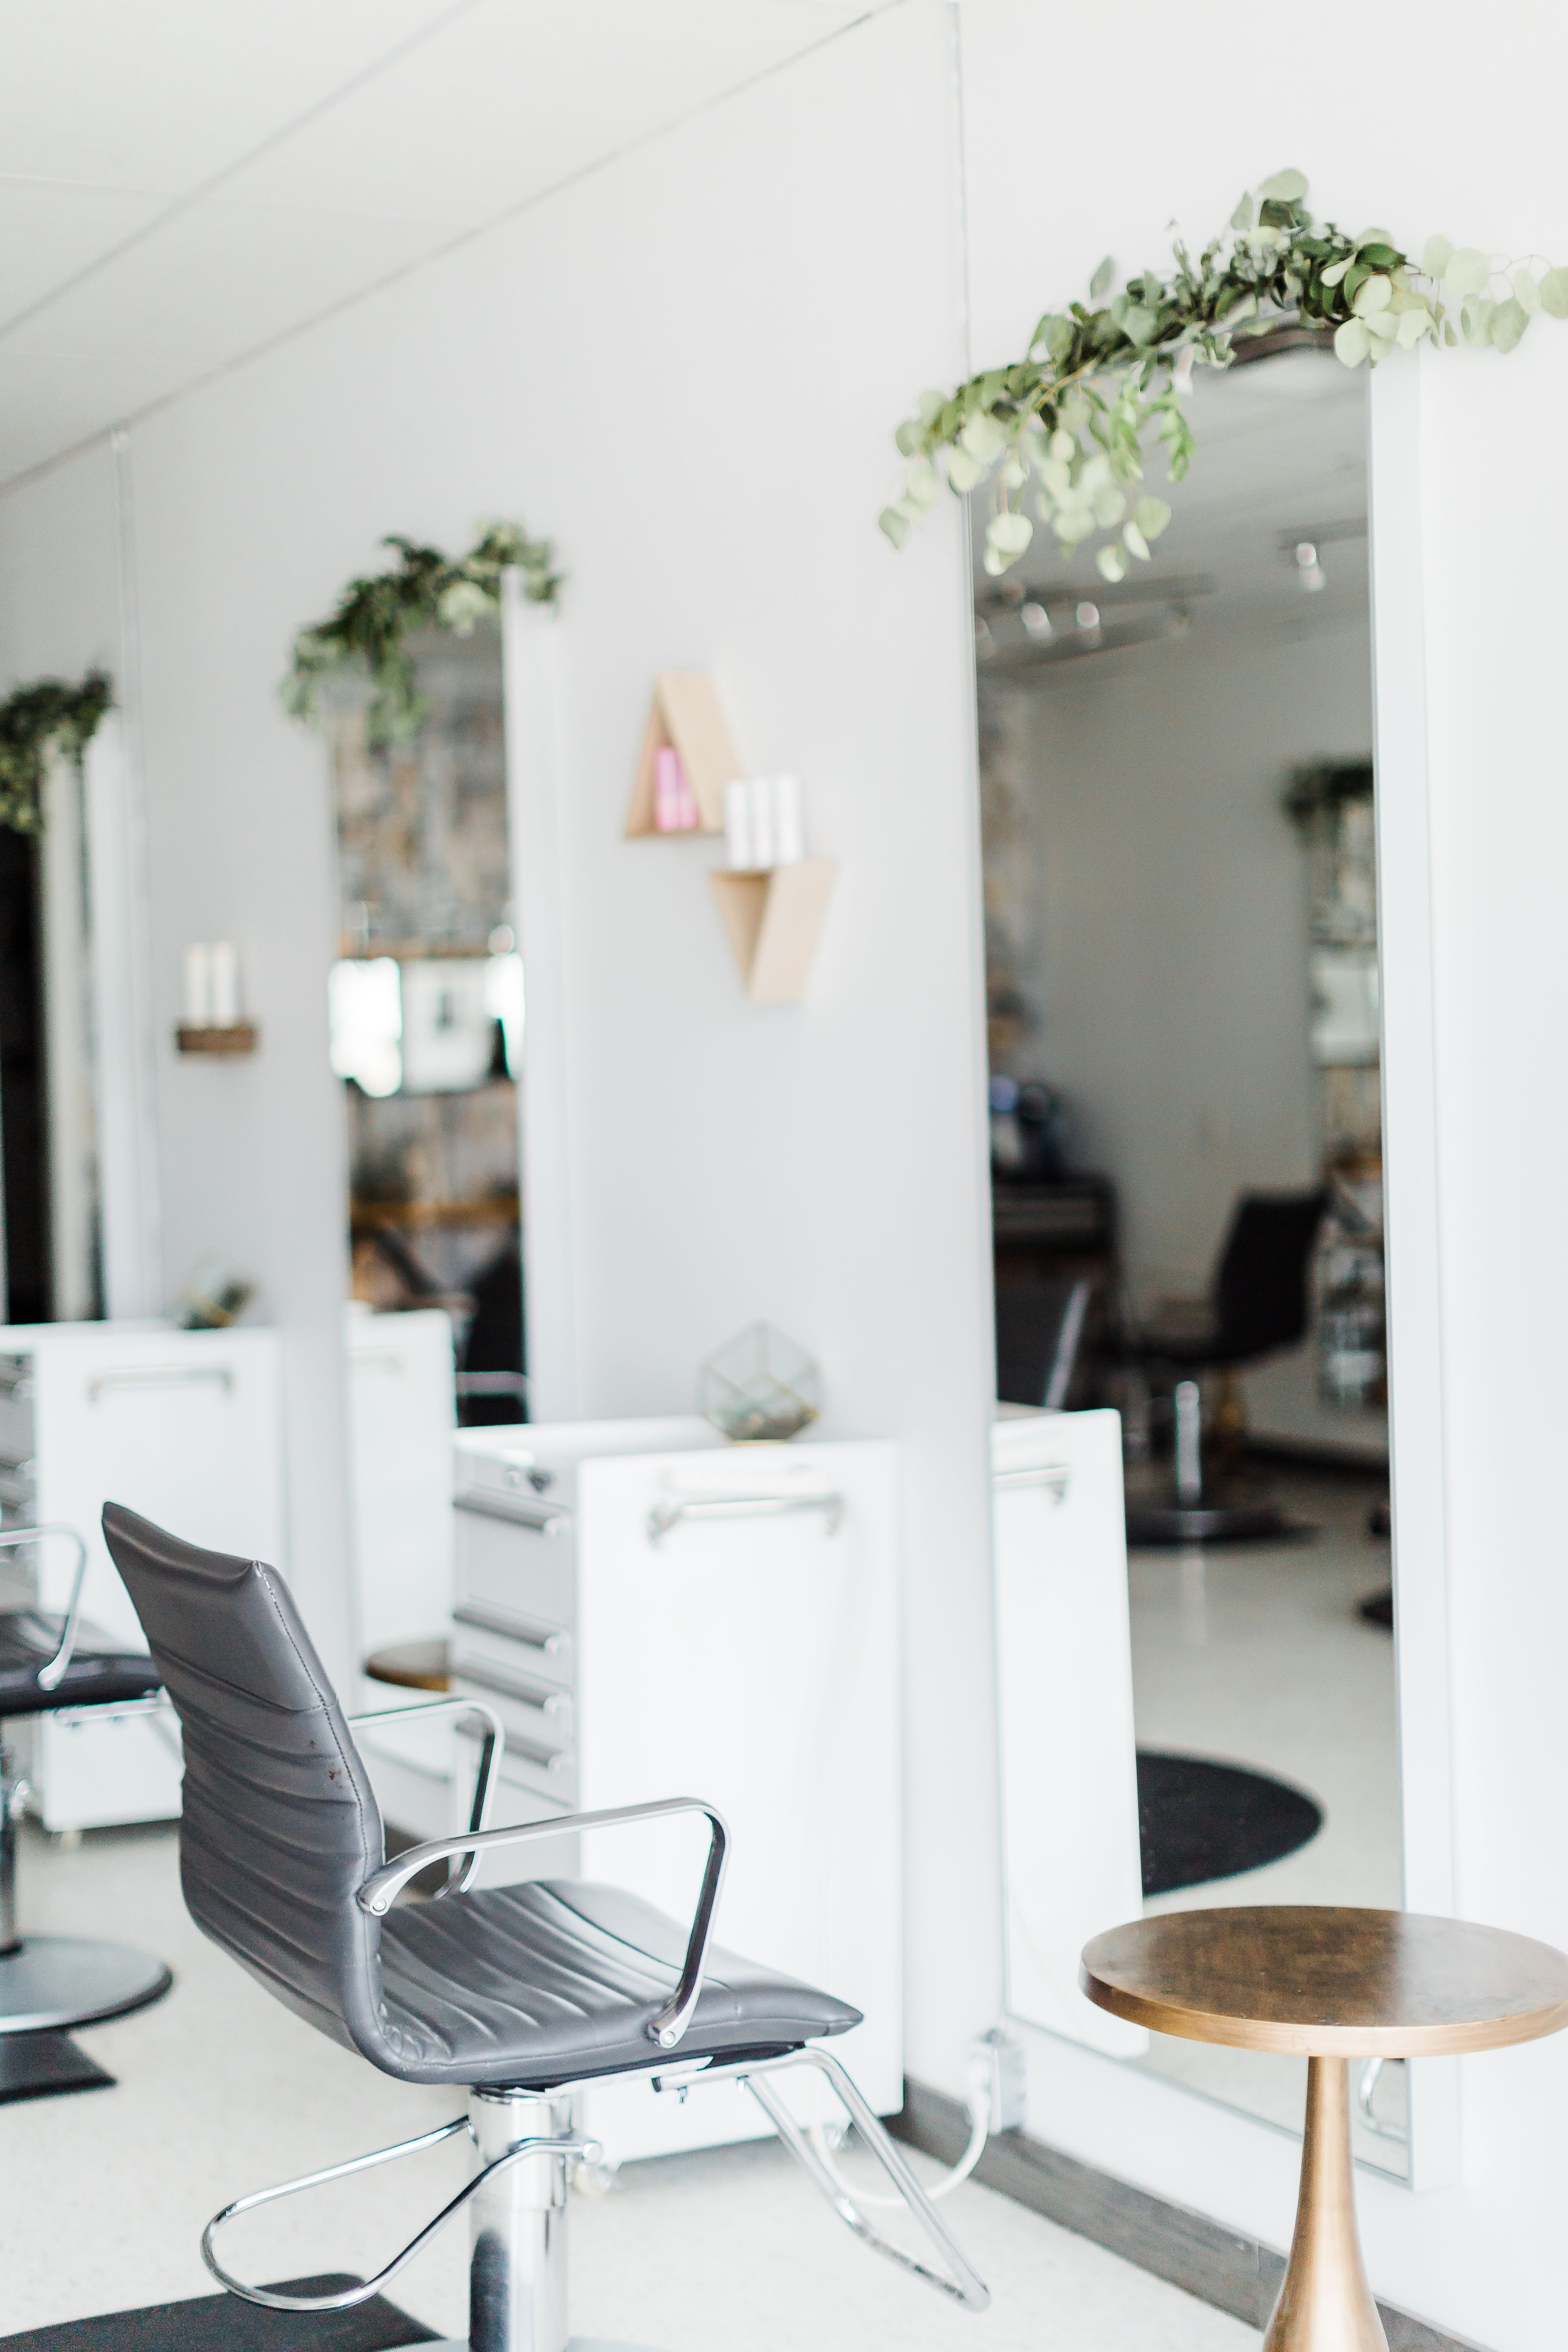 Salon Decor Inspiration From Hairologystudio Clean Earthy Rustic Salon Decor Hair Salon Decor Hair Salon Interior